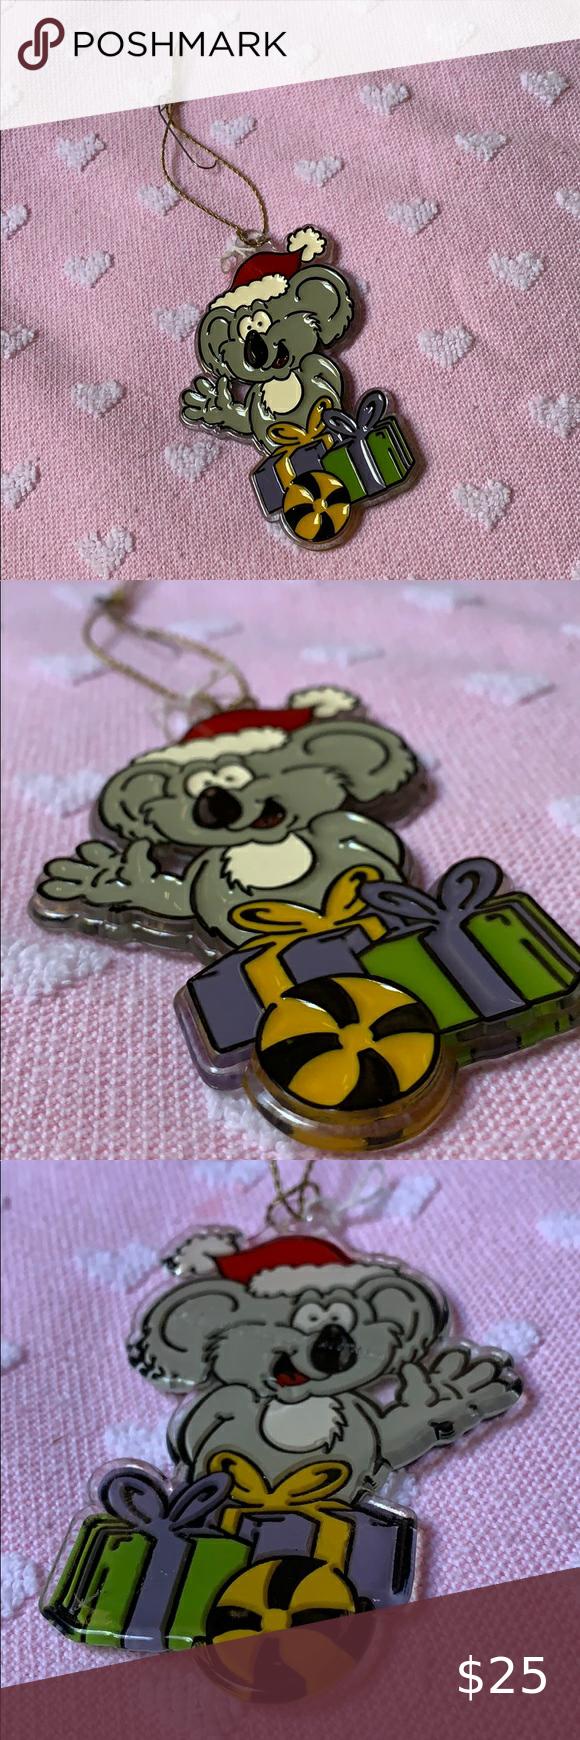 "3.5"" koala 🐨 hard plastic Christmas tree ornament in 2020"